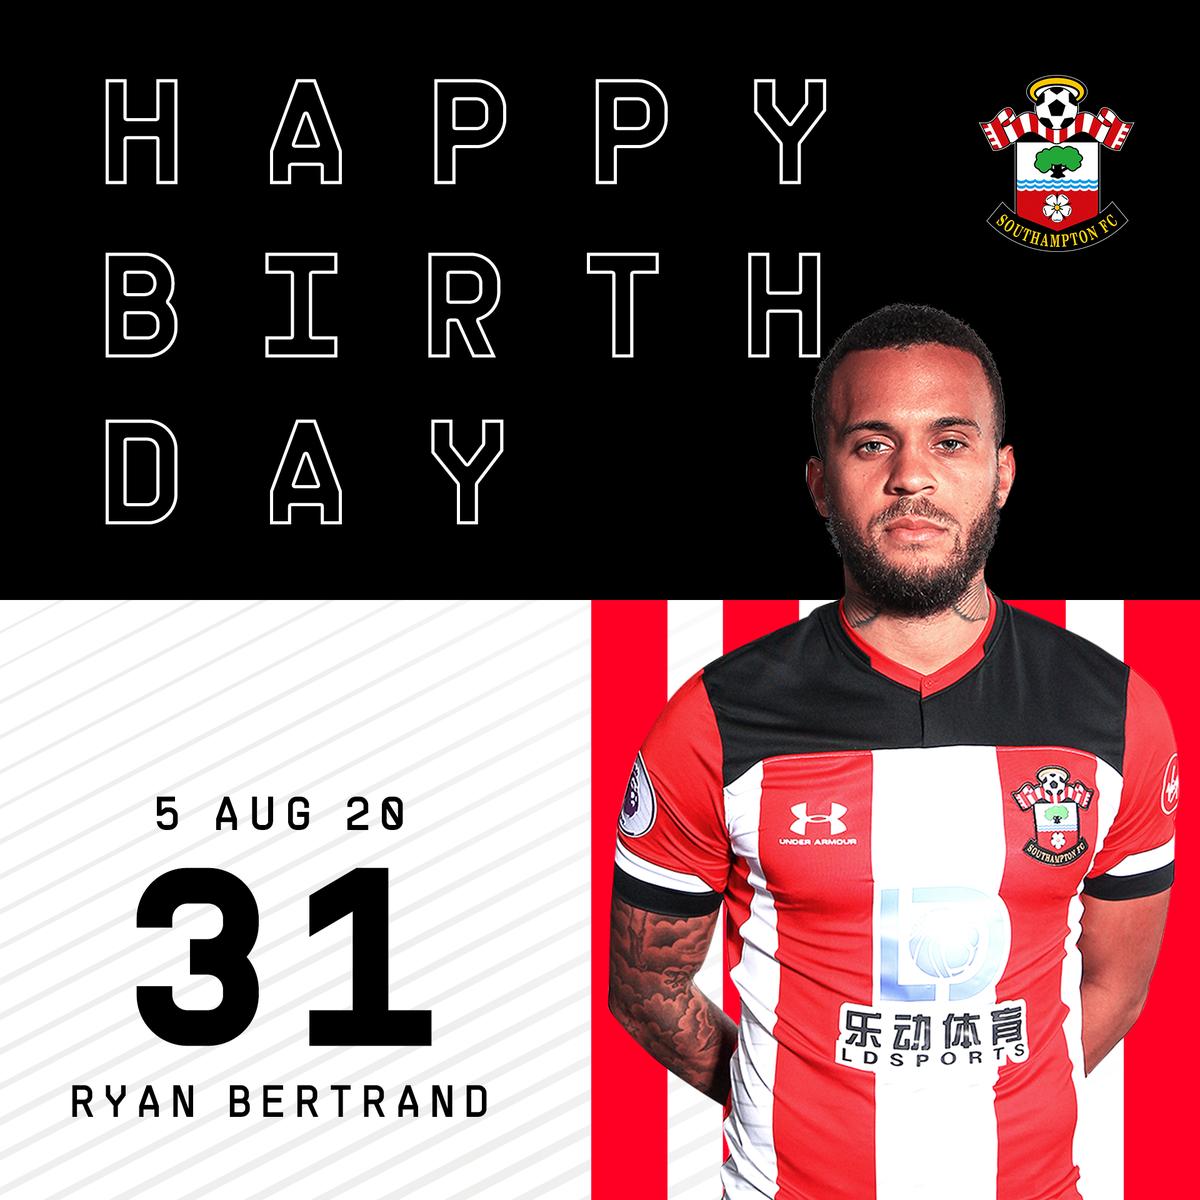 🎉 @ryanbertrand3 🎉 @hojbjerg23 Wishing a very happy birthday to this #SaintsFC duo! 😇